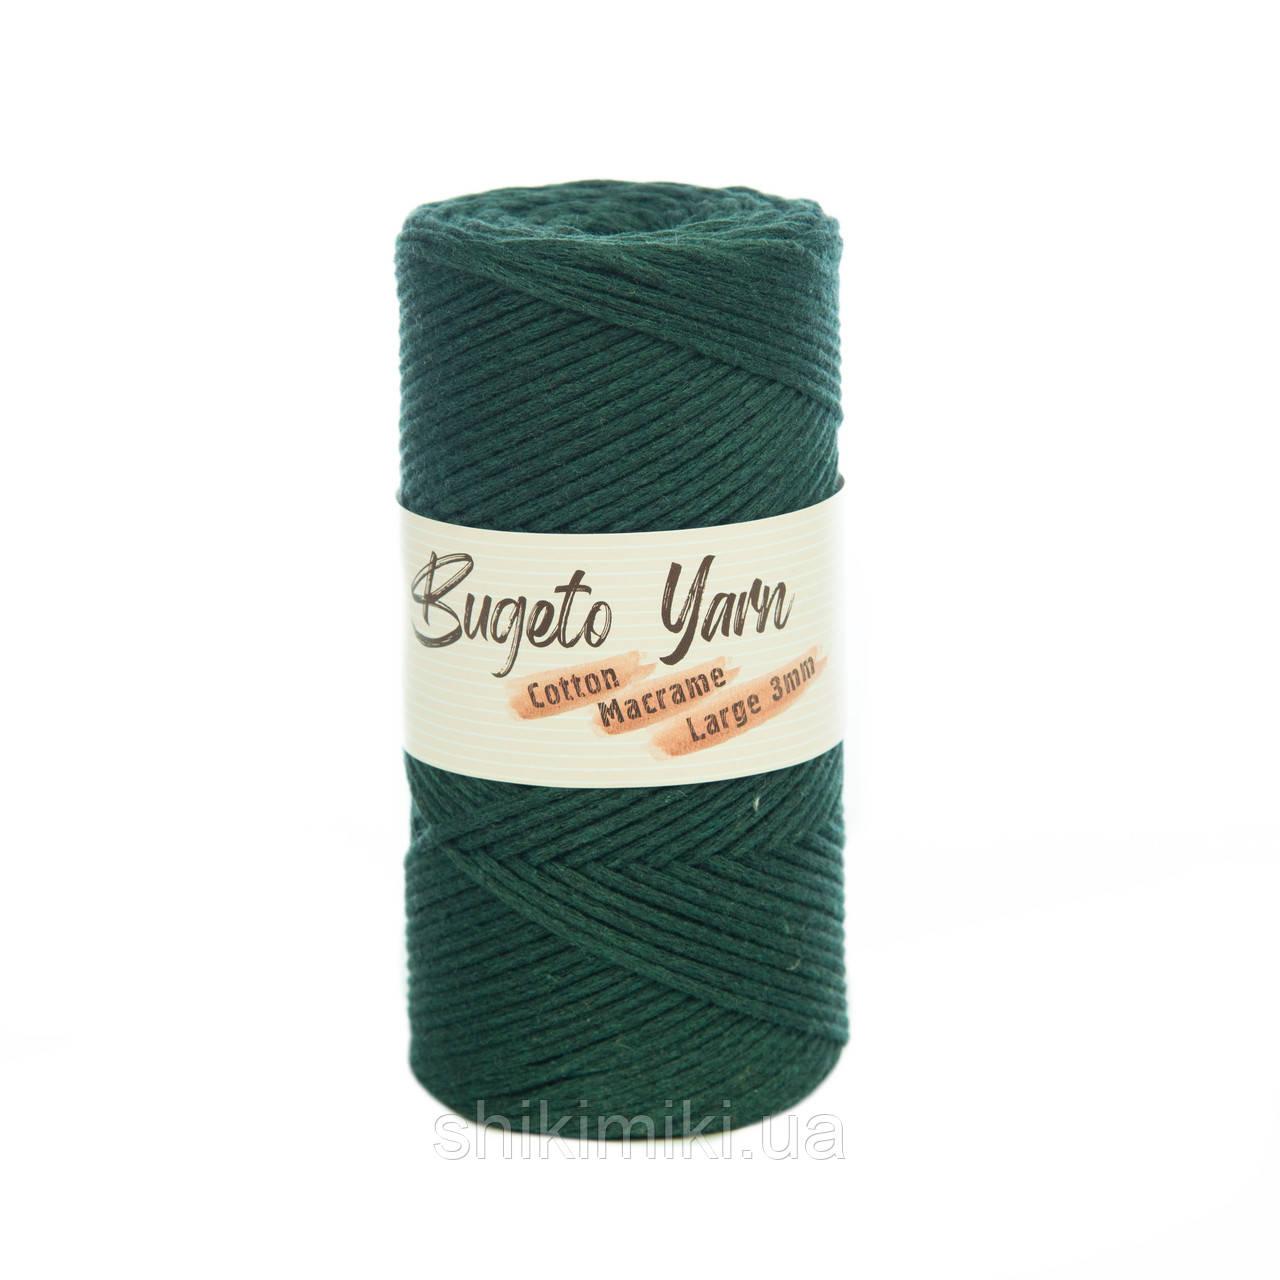 Эко шнур Cotton Macrame Large 3 mm, цвет Темно-зеленый